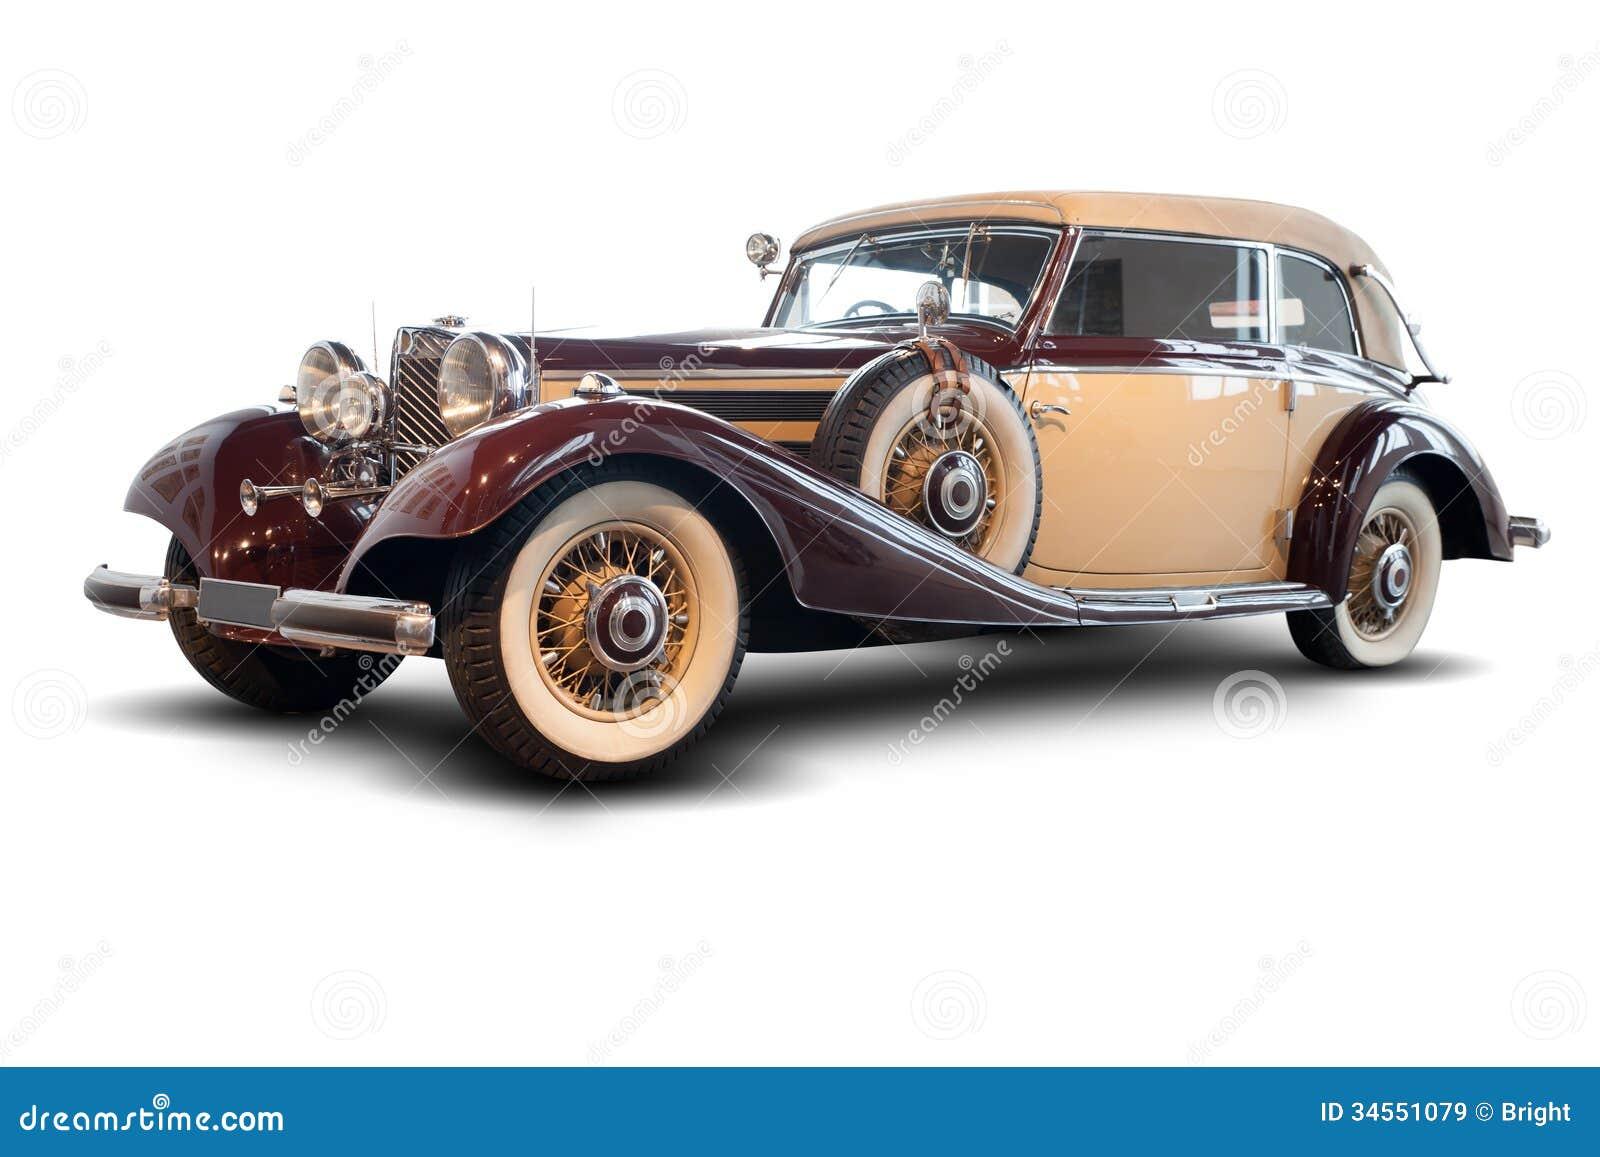 Old mercedes royalty free stock images image 34551079 for Mercedes benz old models